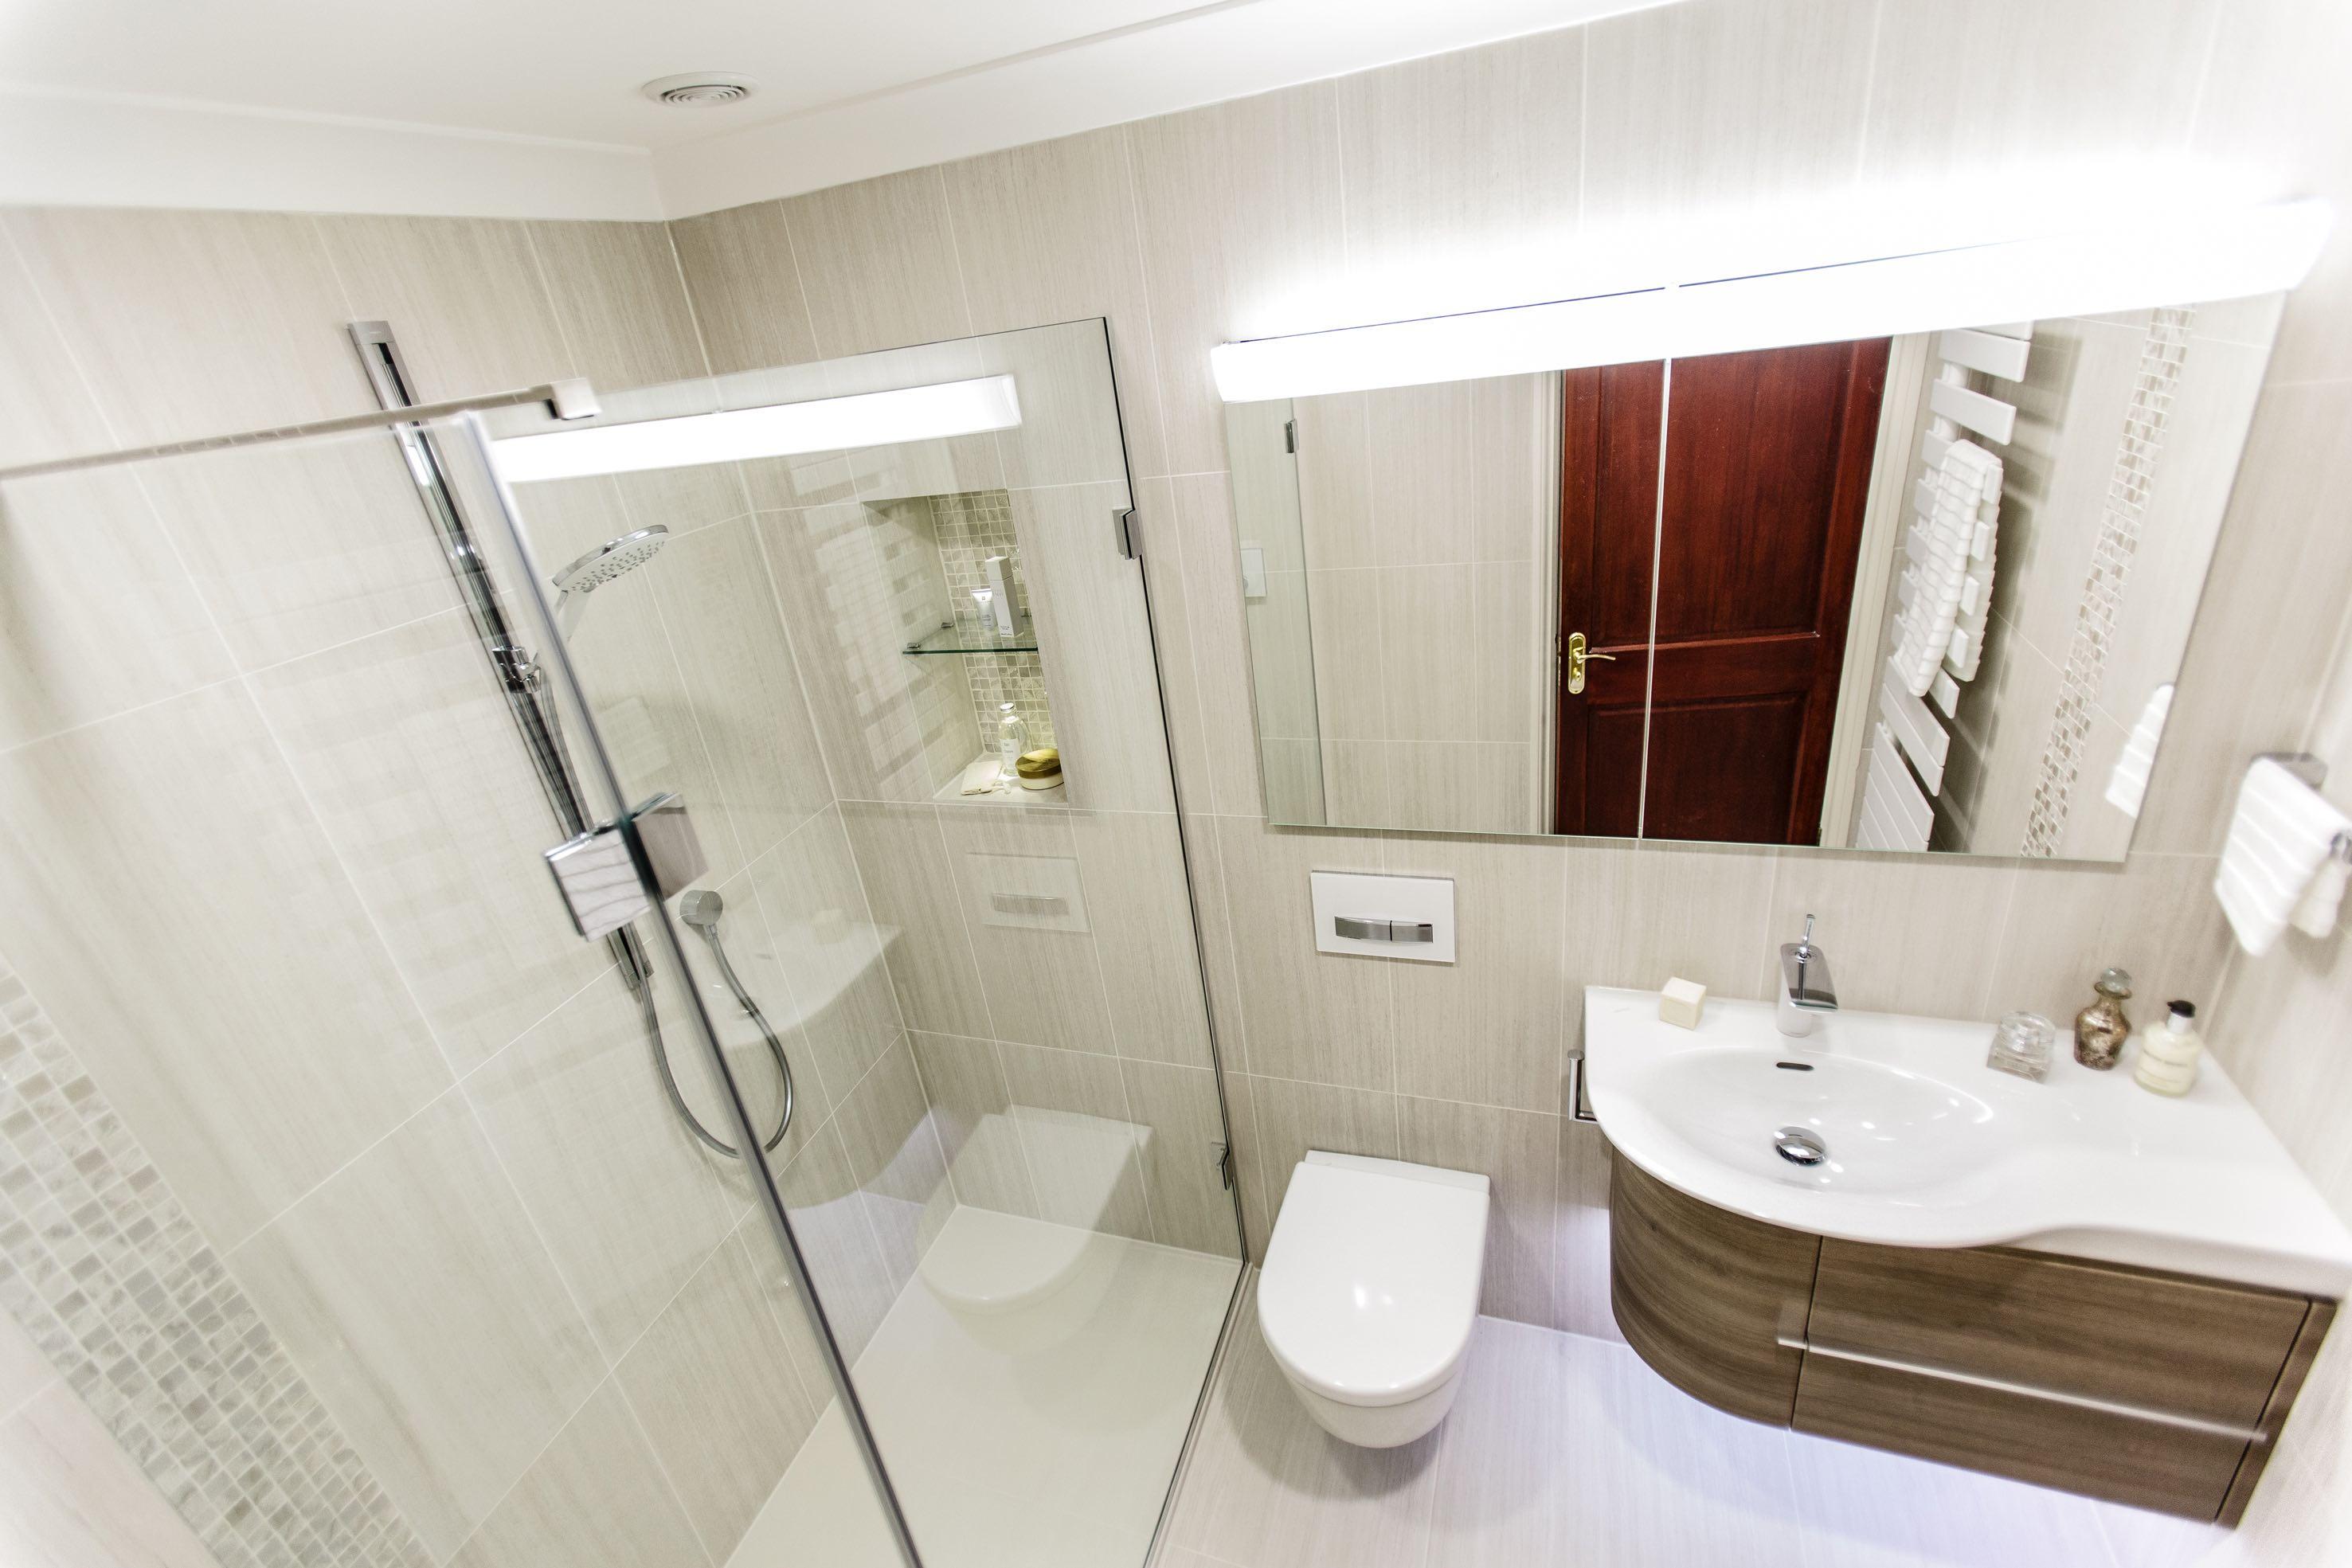 Sanctuary Bathrooms copy